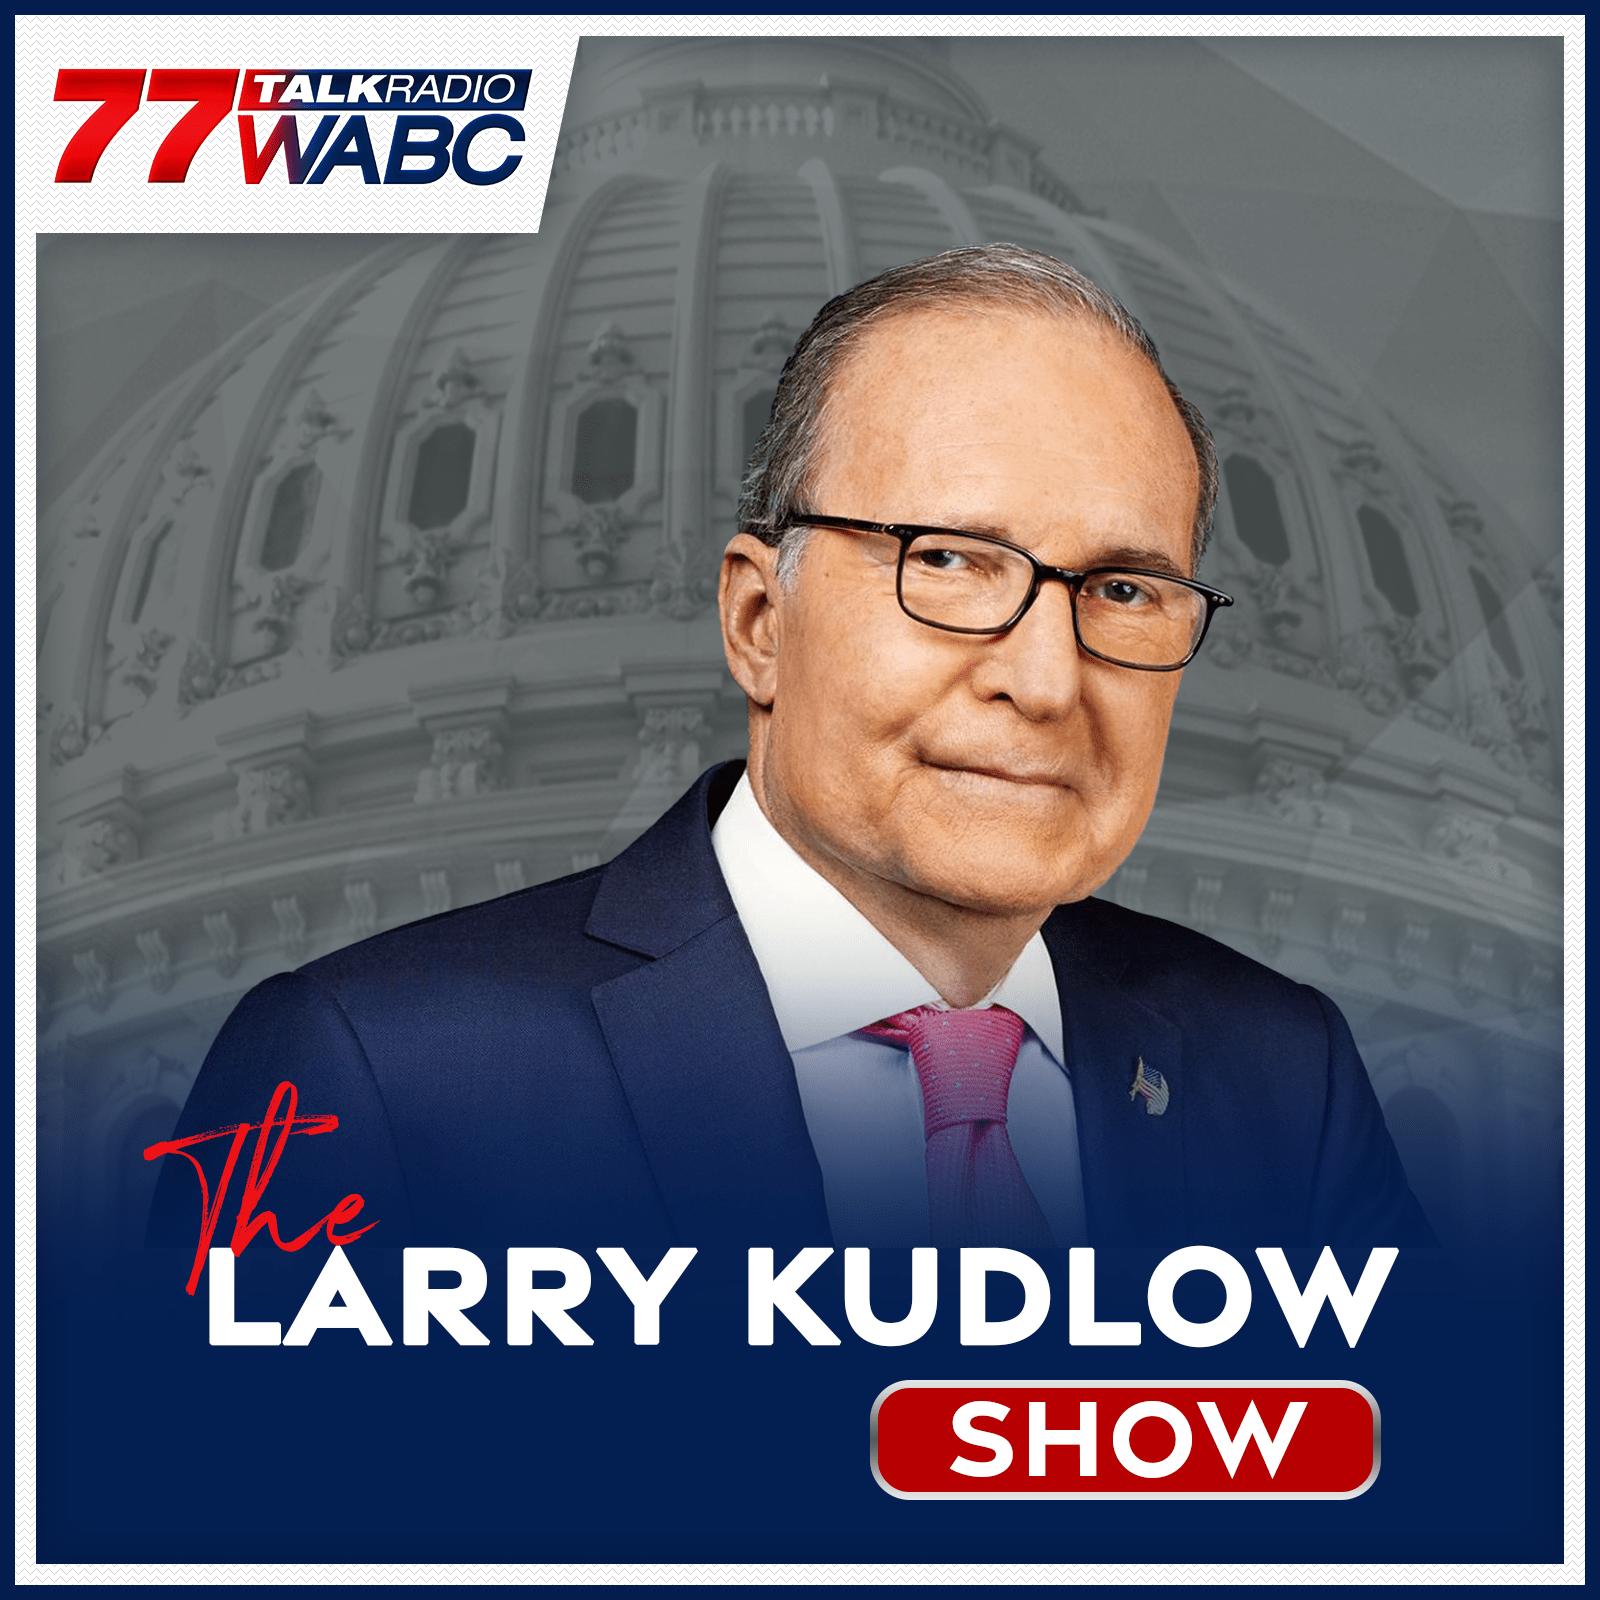 The Larry Kudlow Show